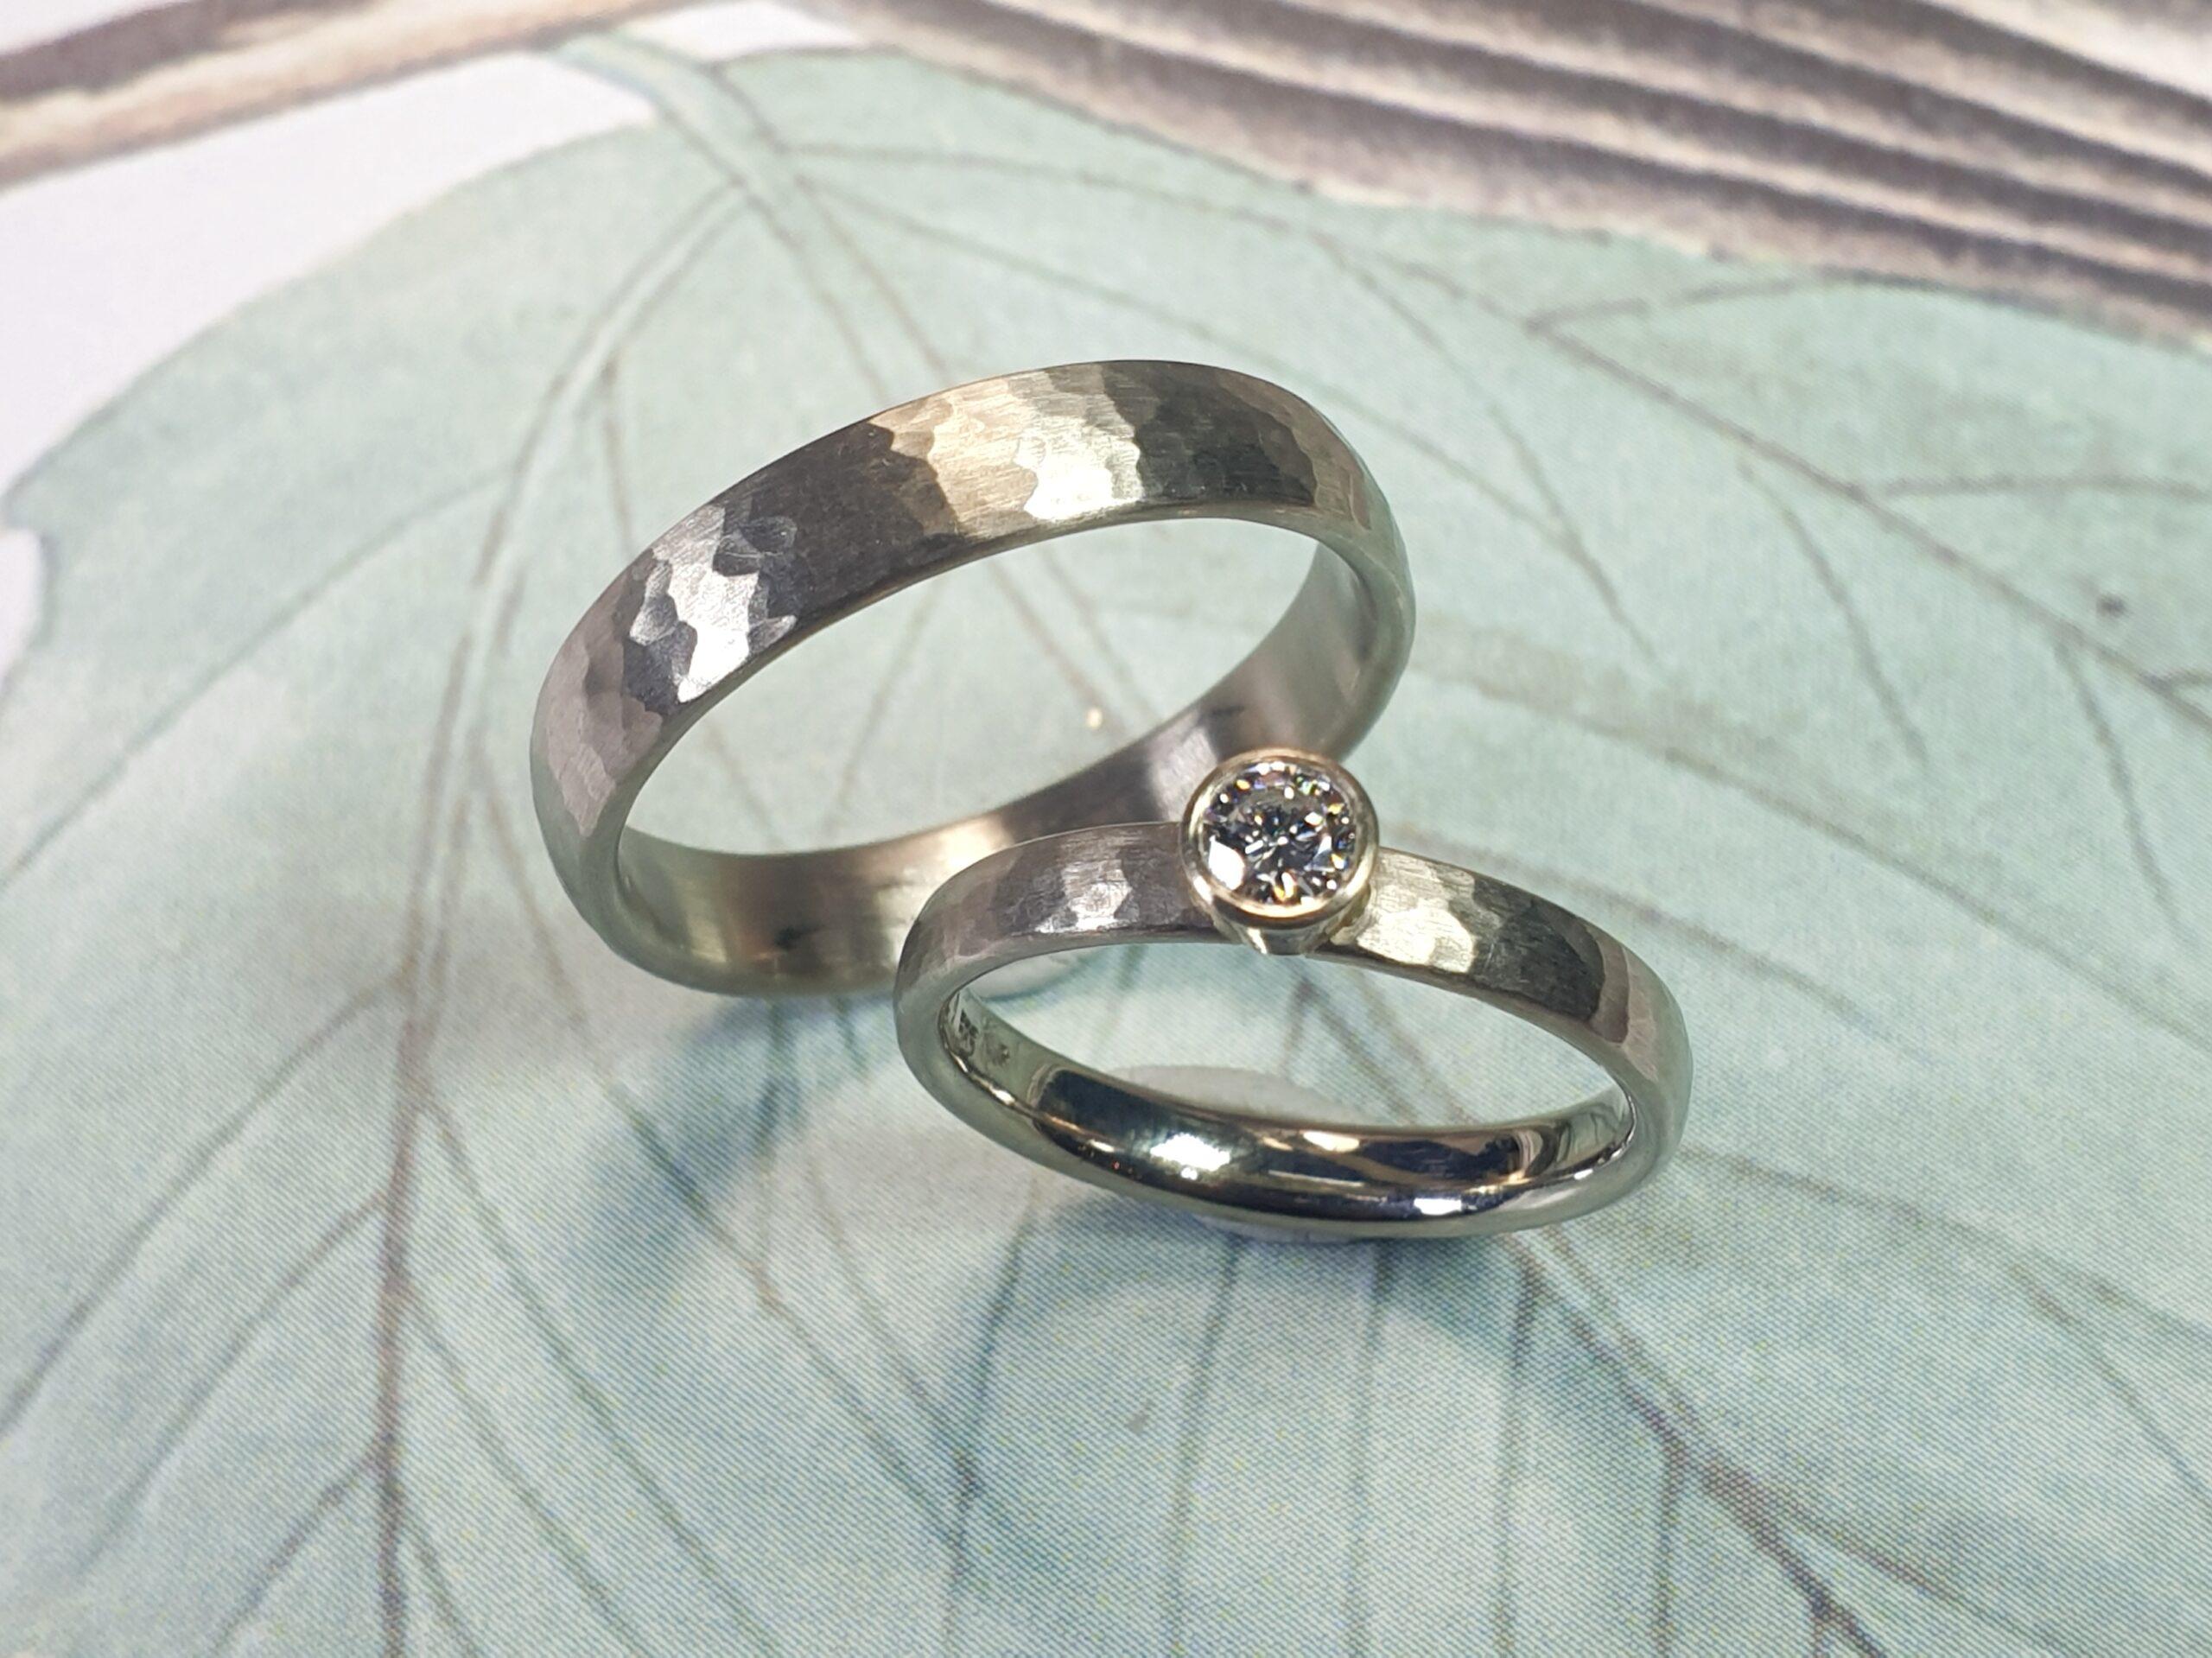 Witgouden 'Ritme' trouwringen met hamerslag en briljant geslepen diamant. Sieraad Ontwerp van Oogst